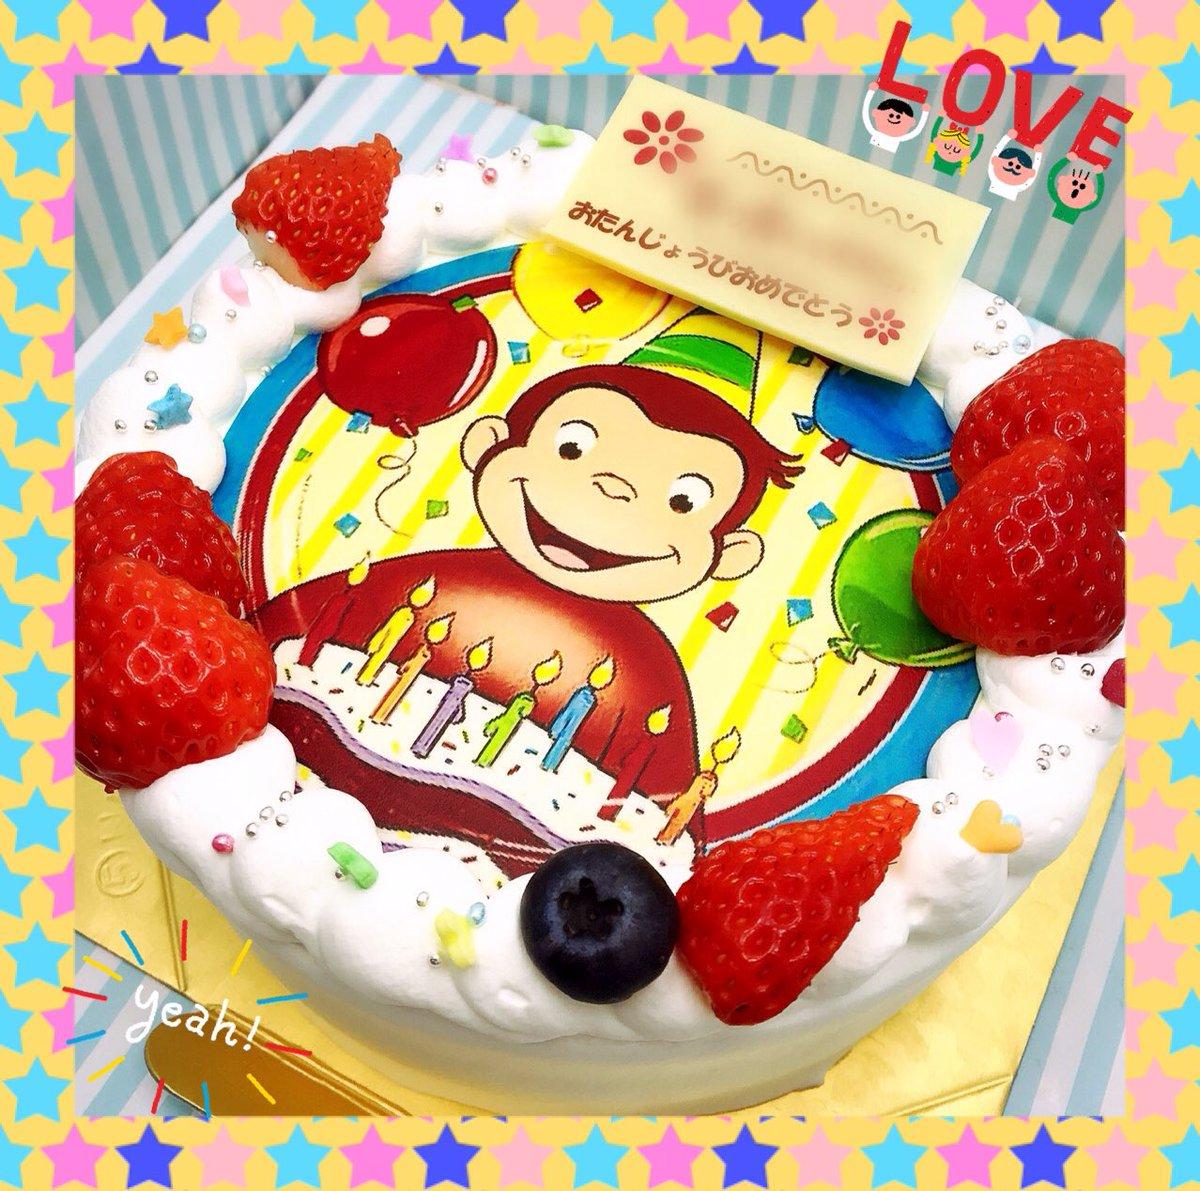 Tweet added by サプライズケーキ専門店 菓の香 , Download